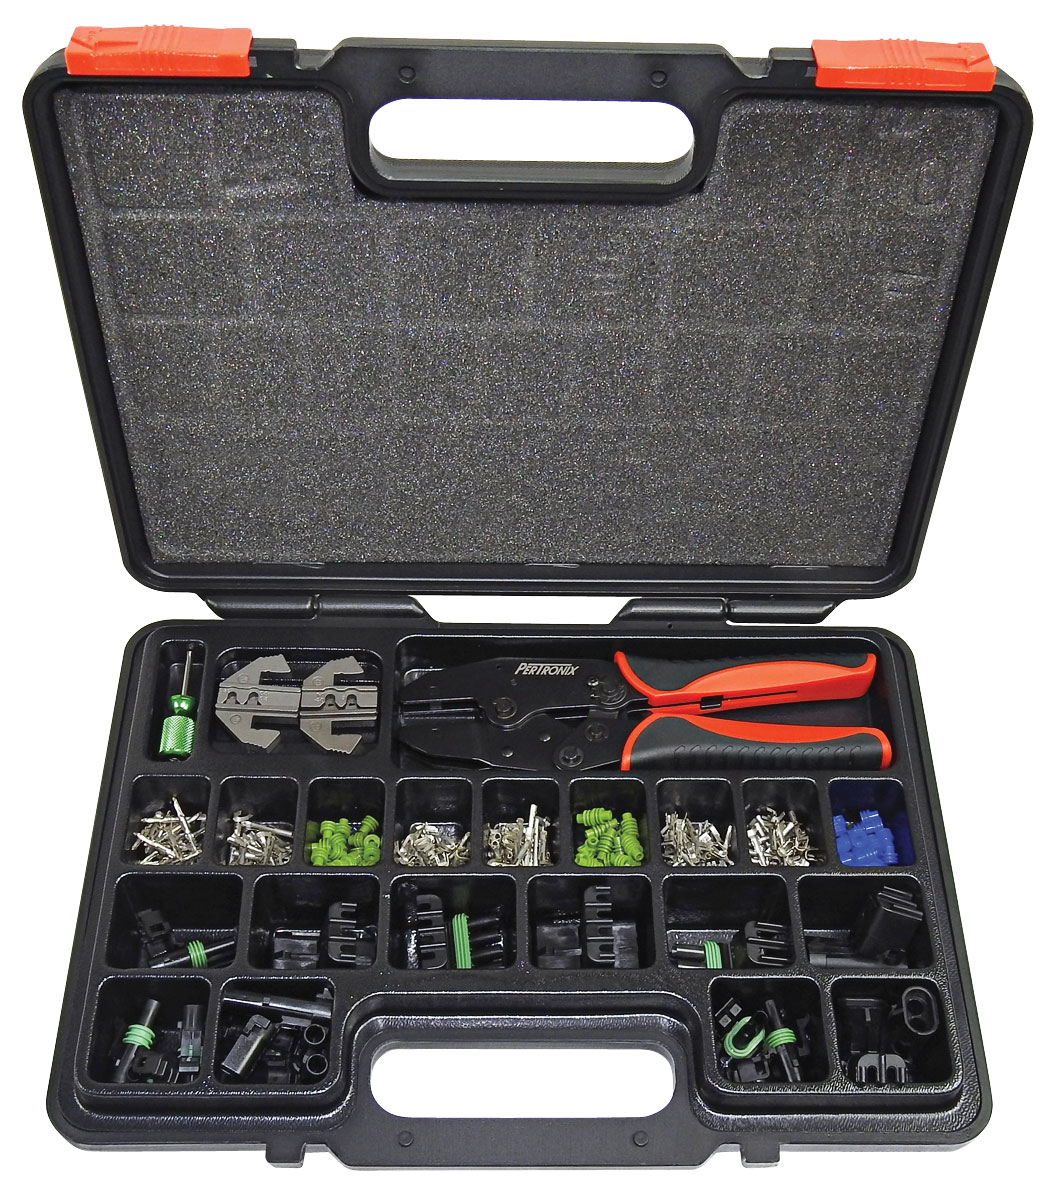 Tool, Pertronix Ratchet Crimp, w/Weather Pack Connector Set, 220PC